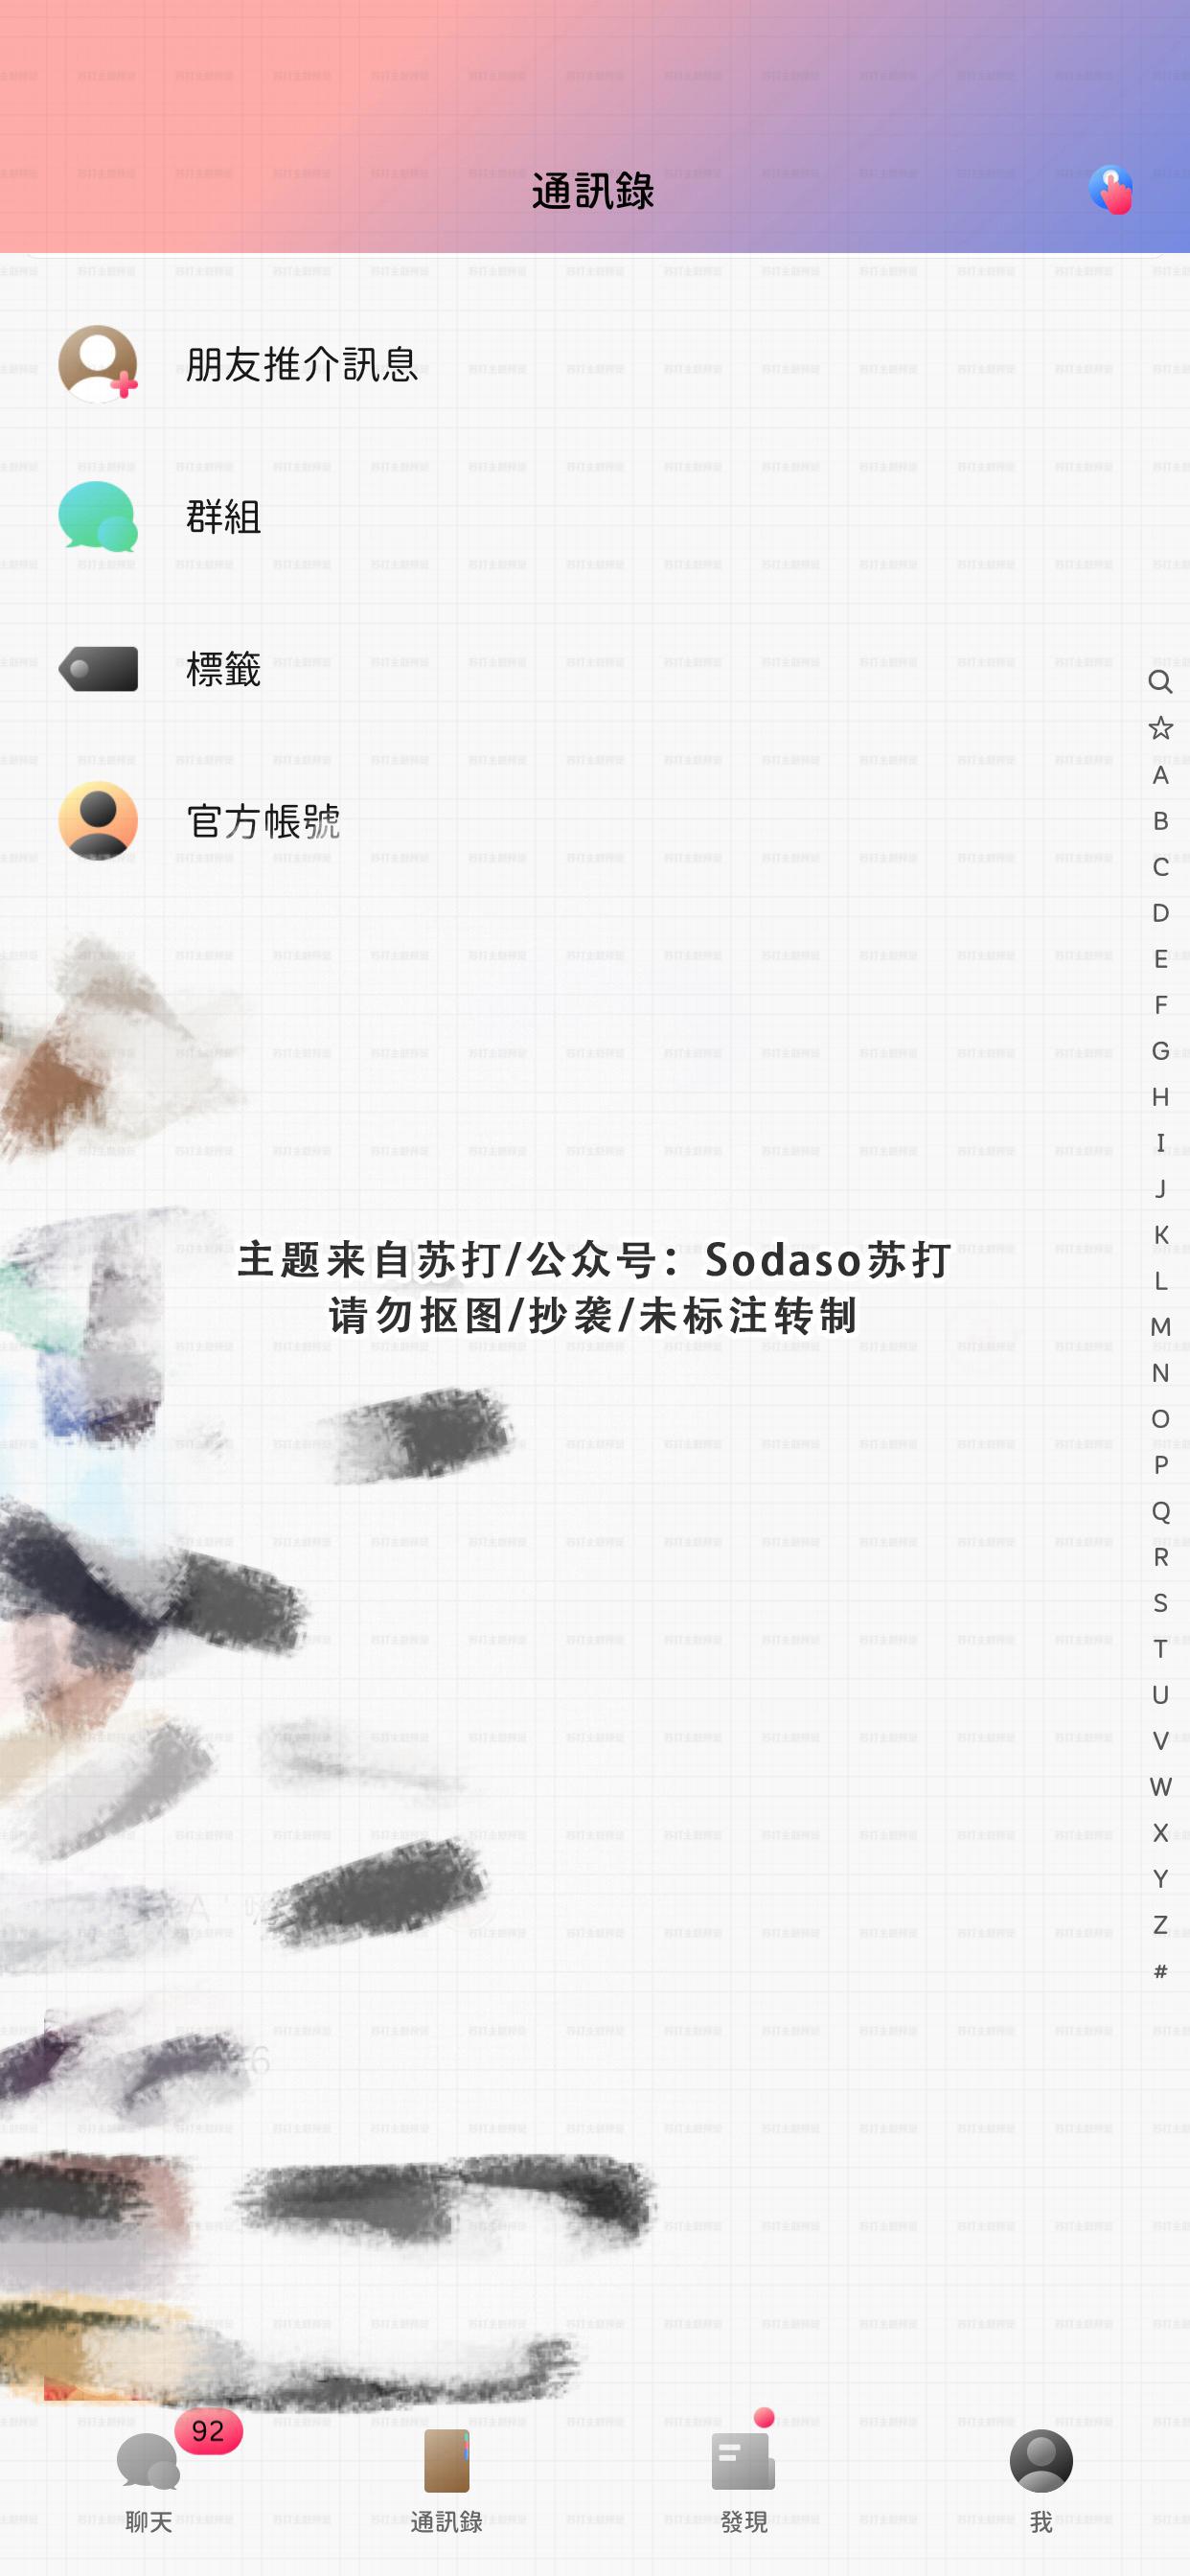 Faded WeChatTheme(微信主题) - 1.0